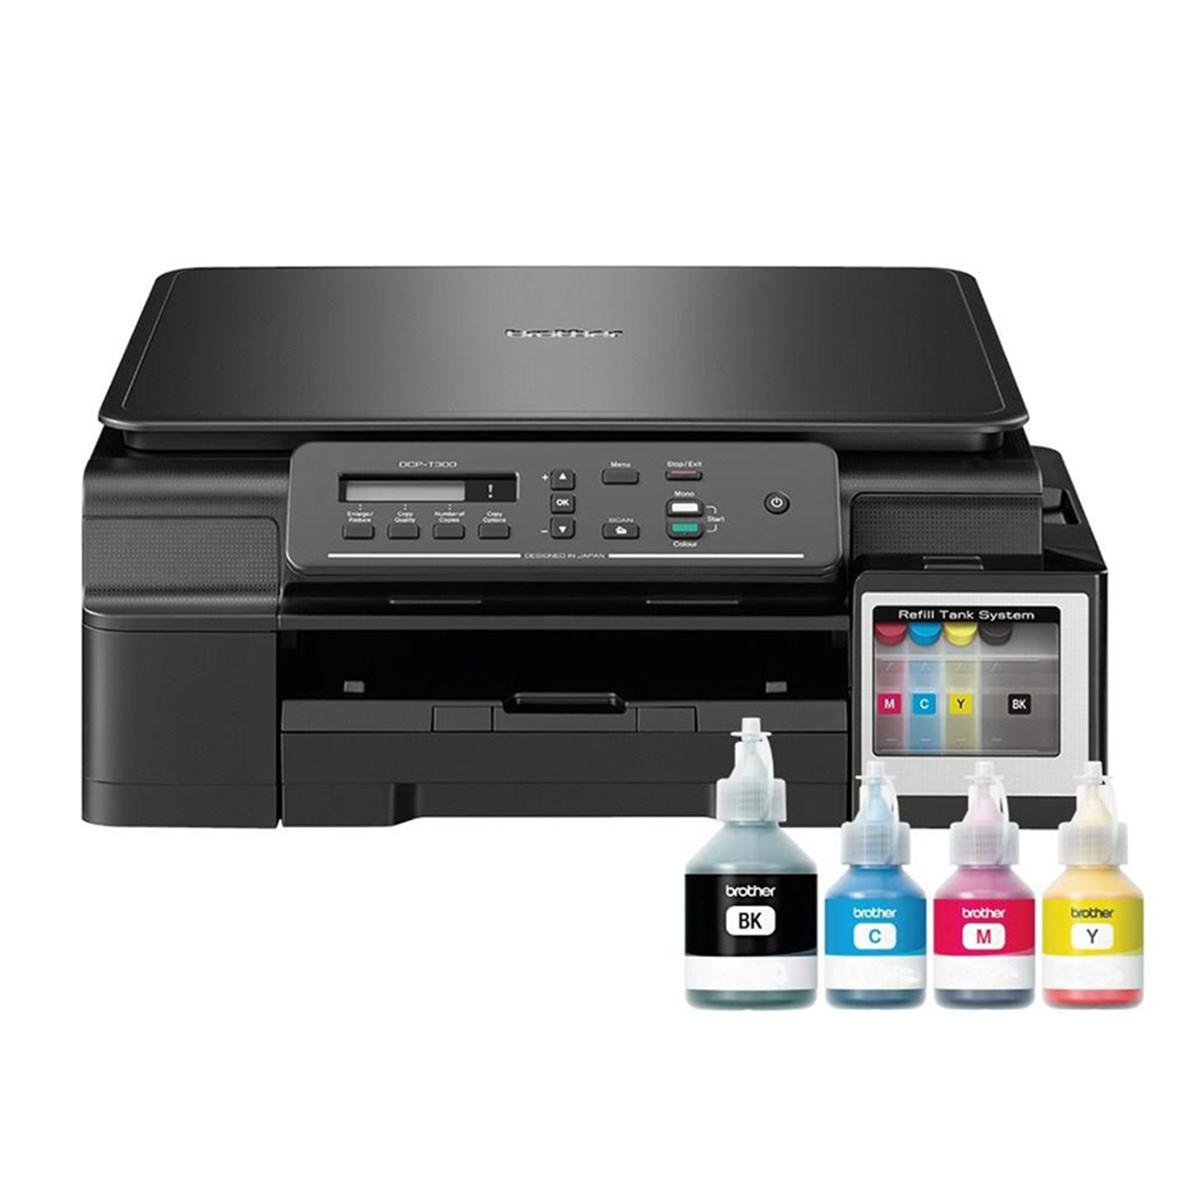 Impressora Brother DCP-T310 Multifuncional Tanque de Tinta Colorida